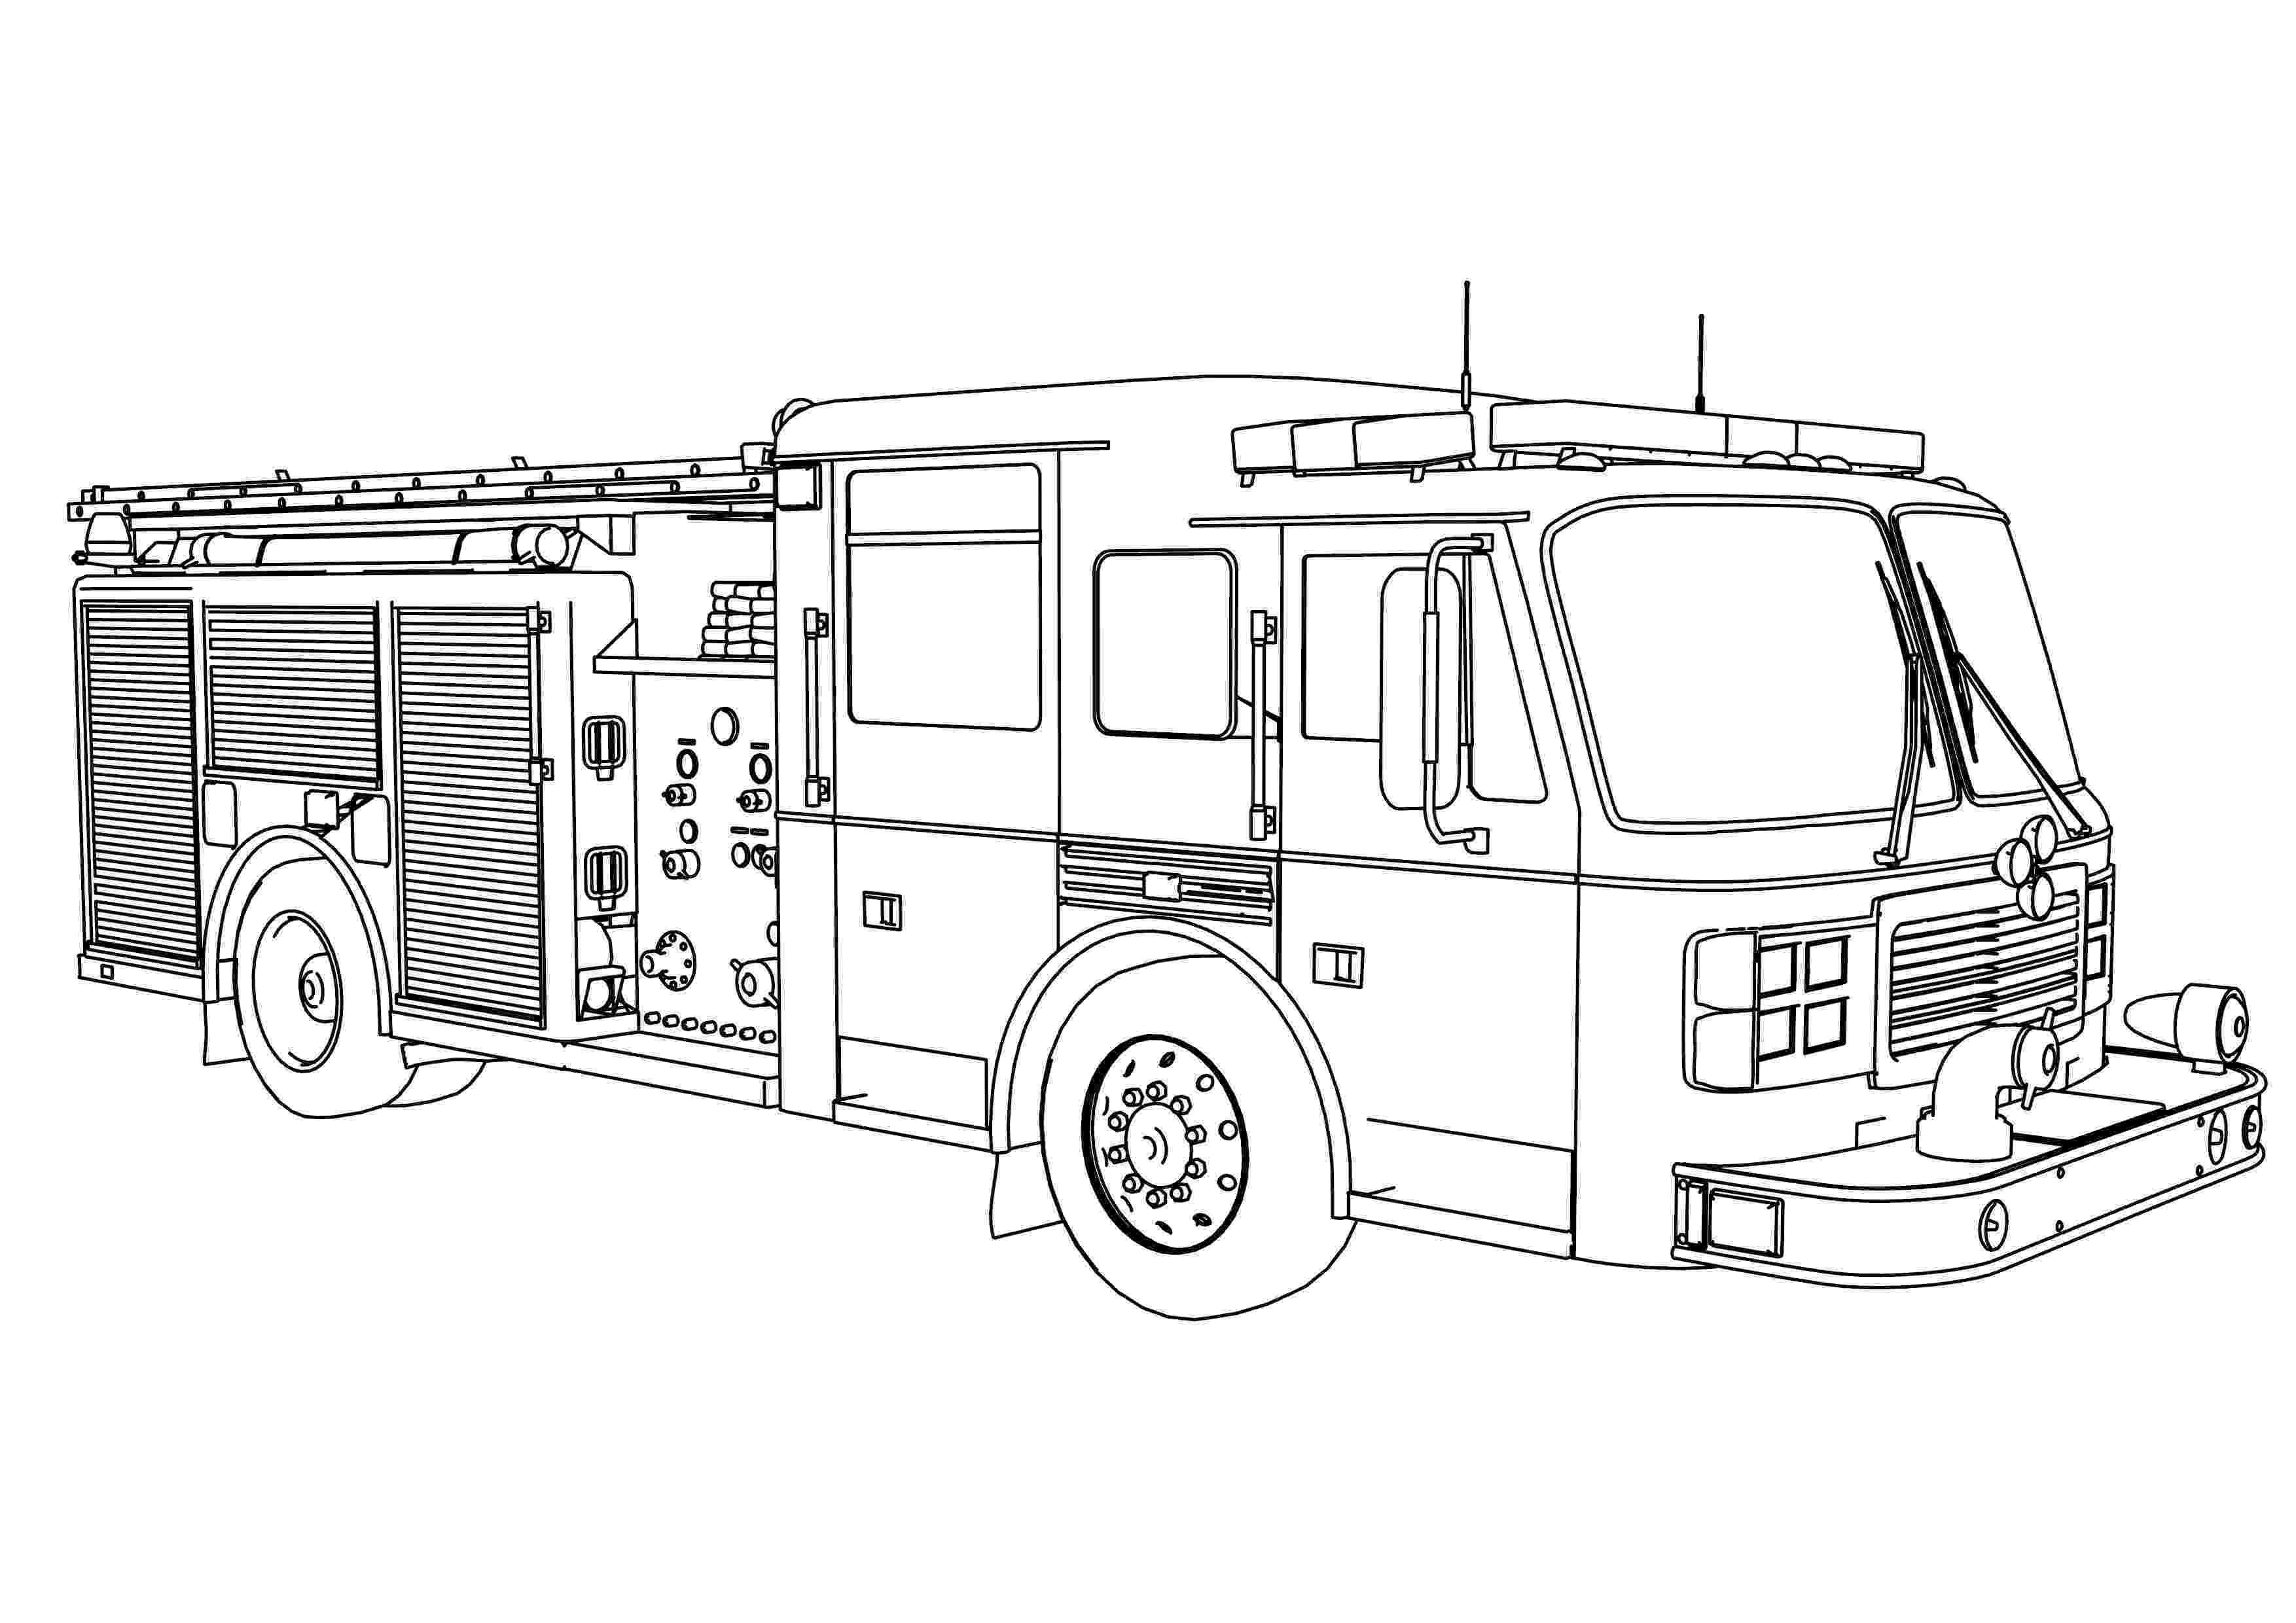 coloring pages of semi trucks semi truck coloring pages to print free coloring books coloring pages of semi trucks